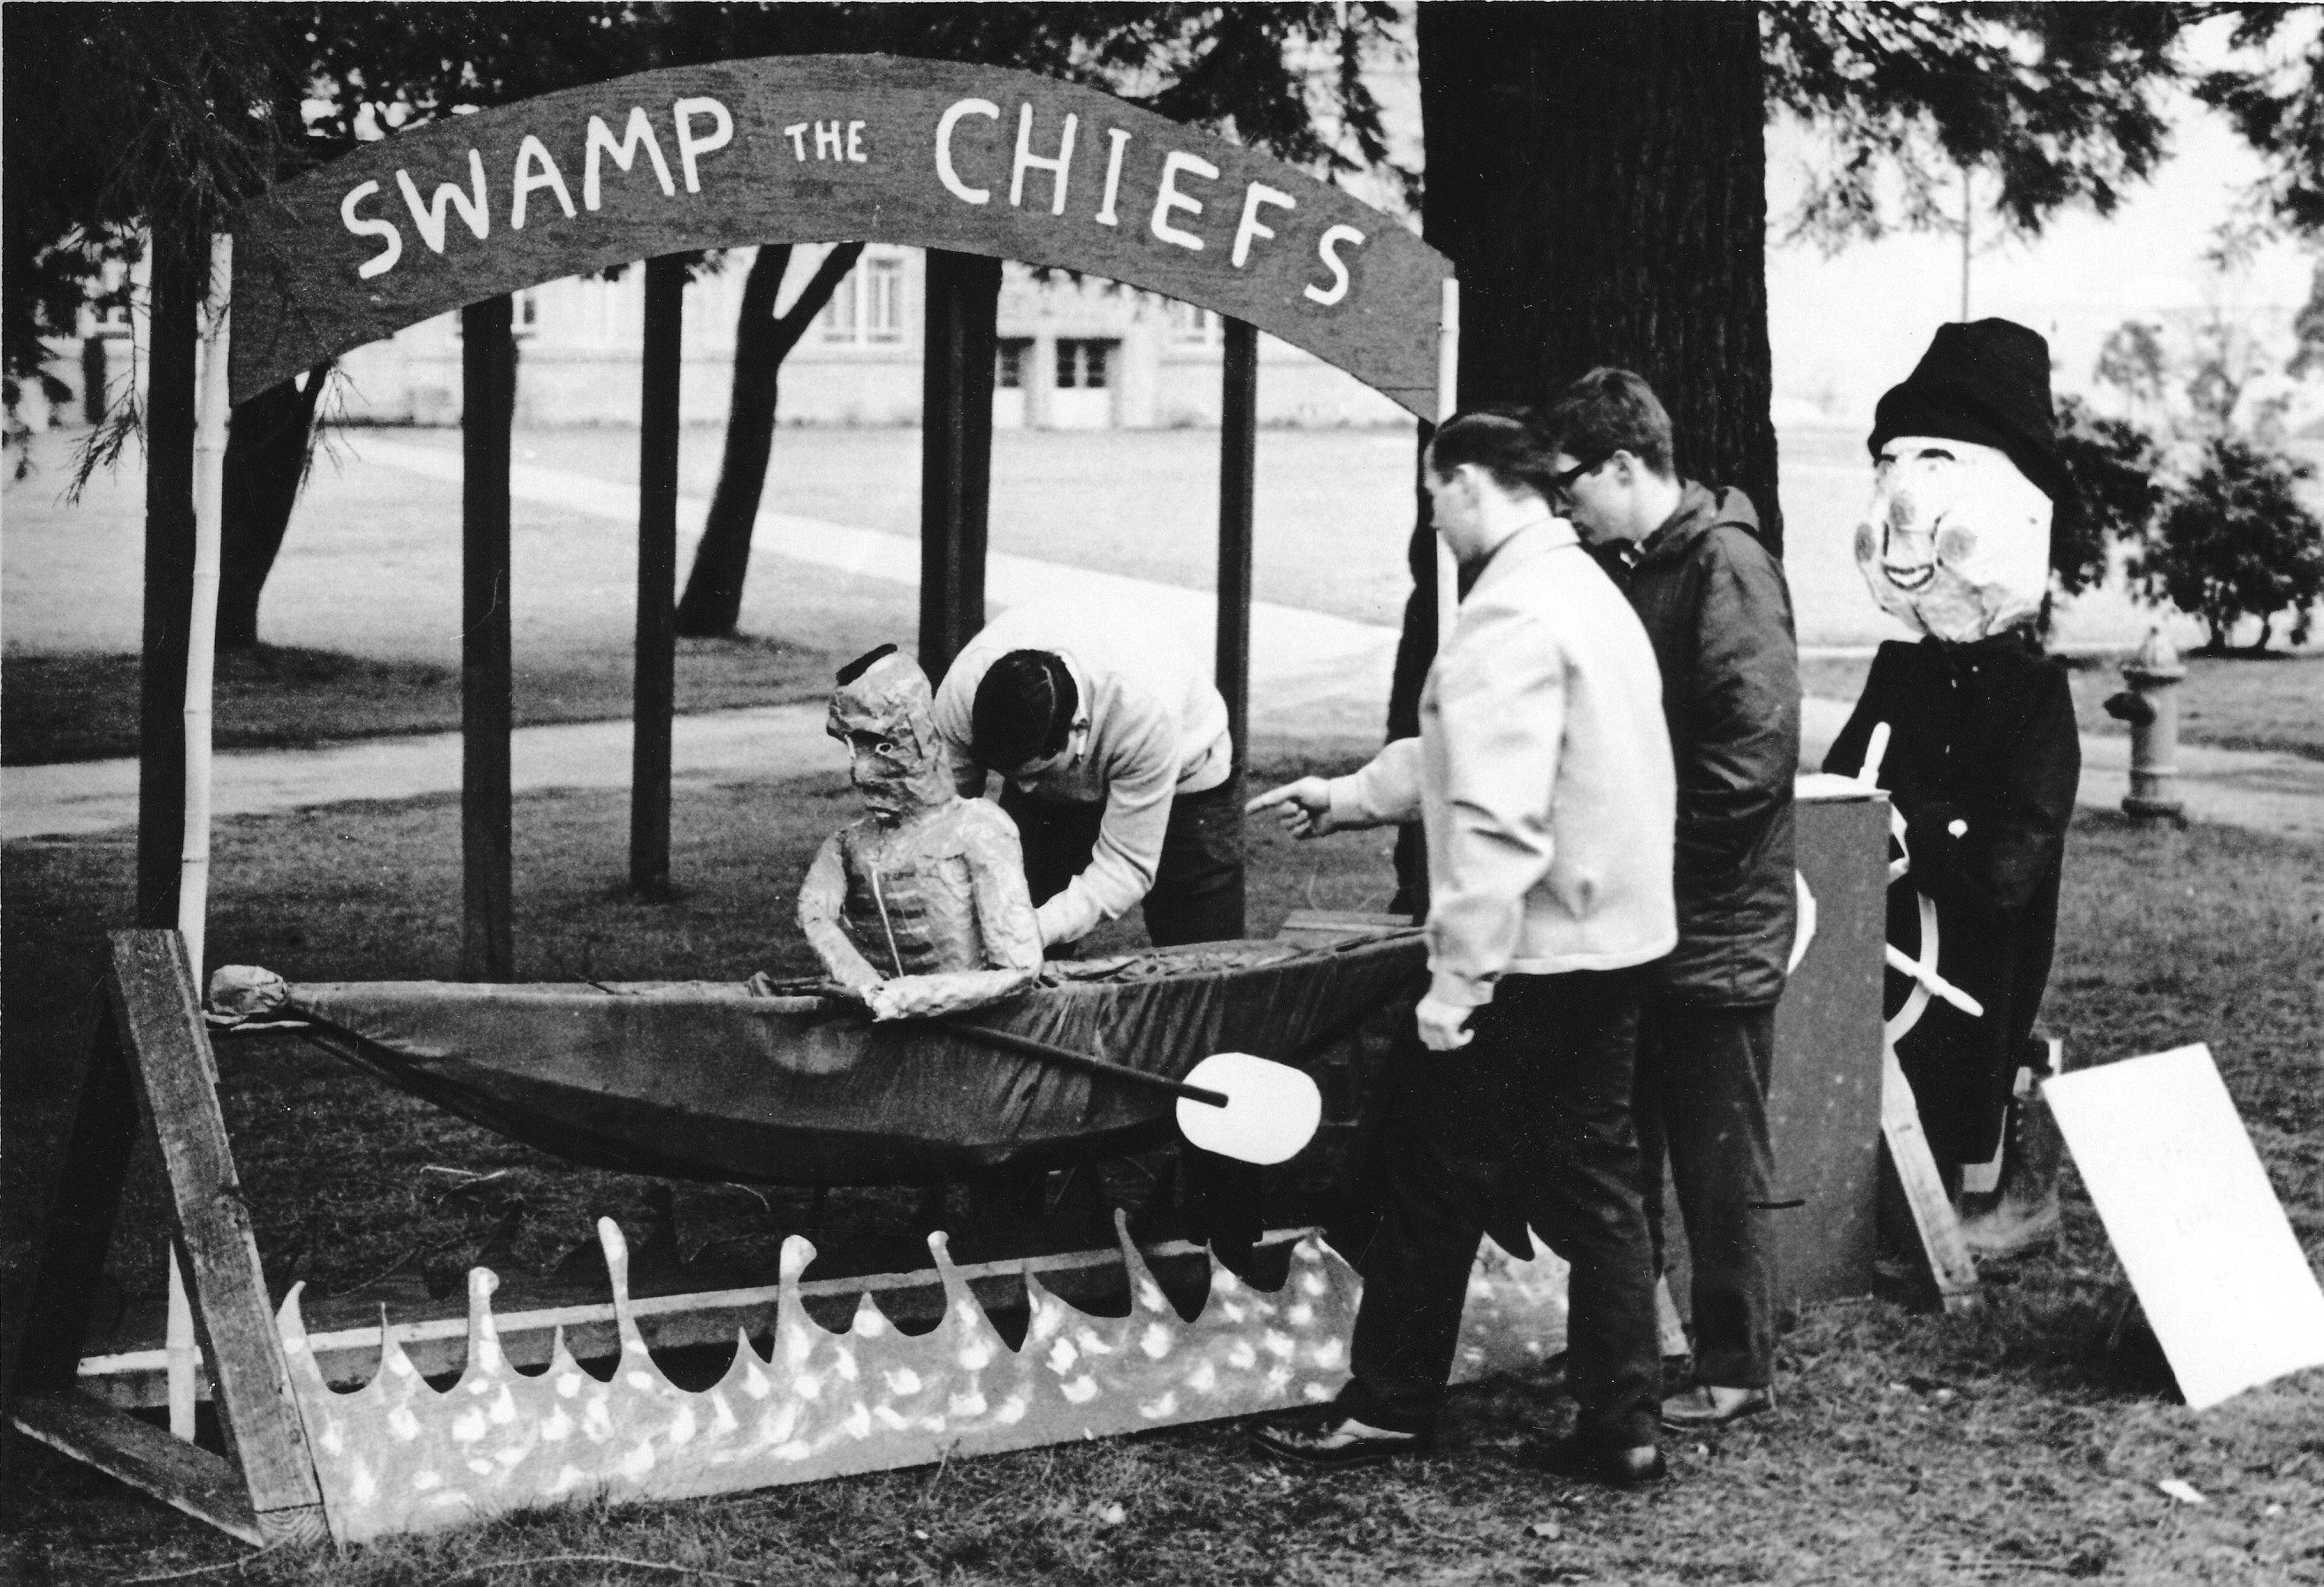 Homecoming display, 1965 or 1966